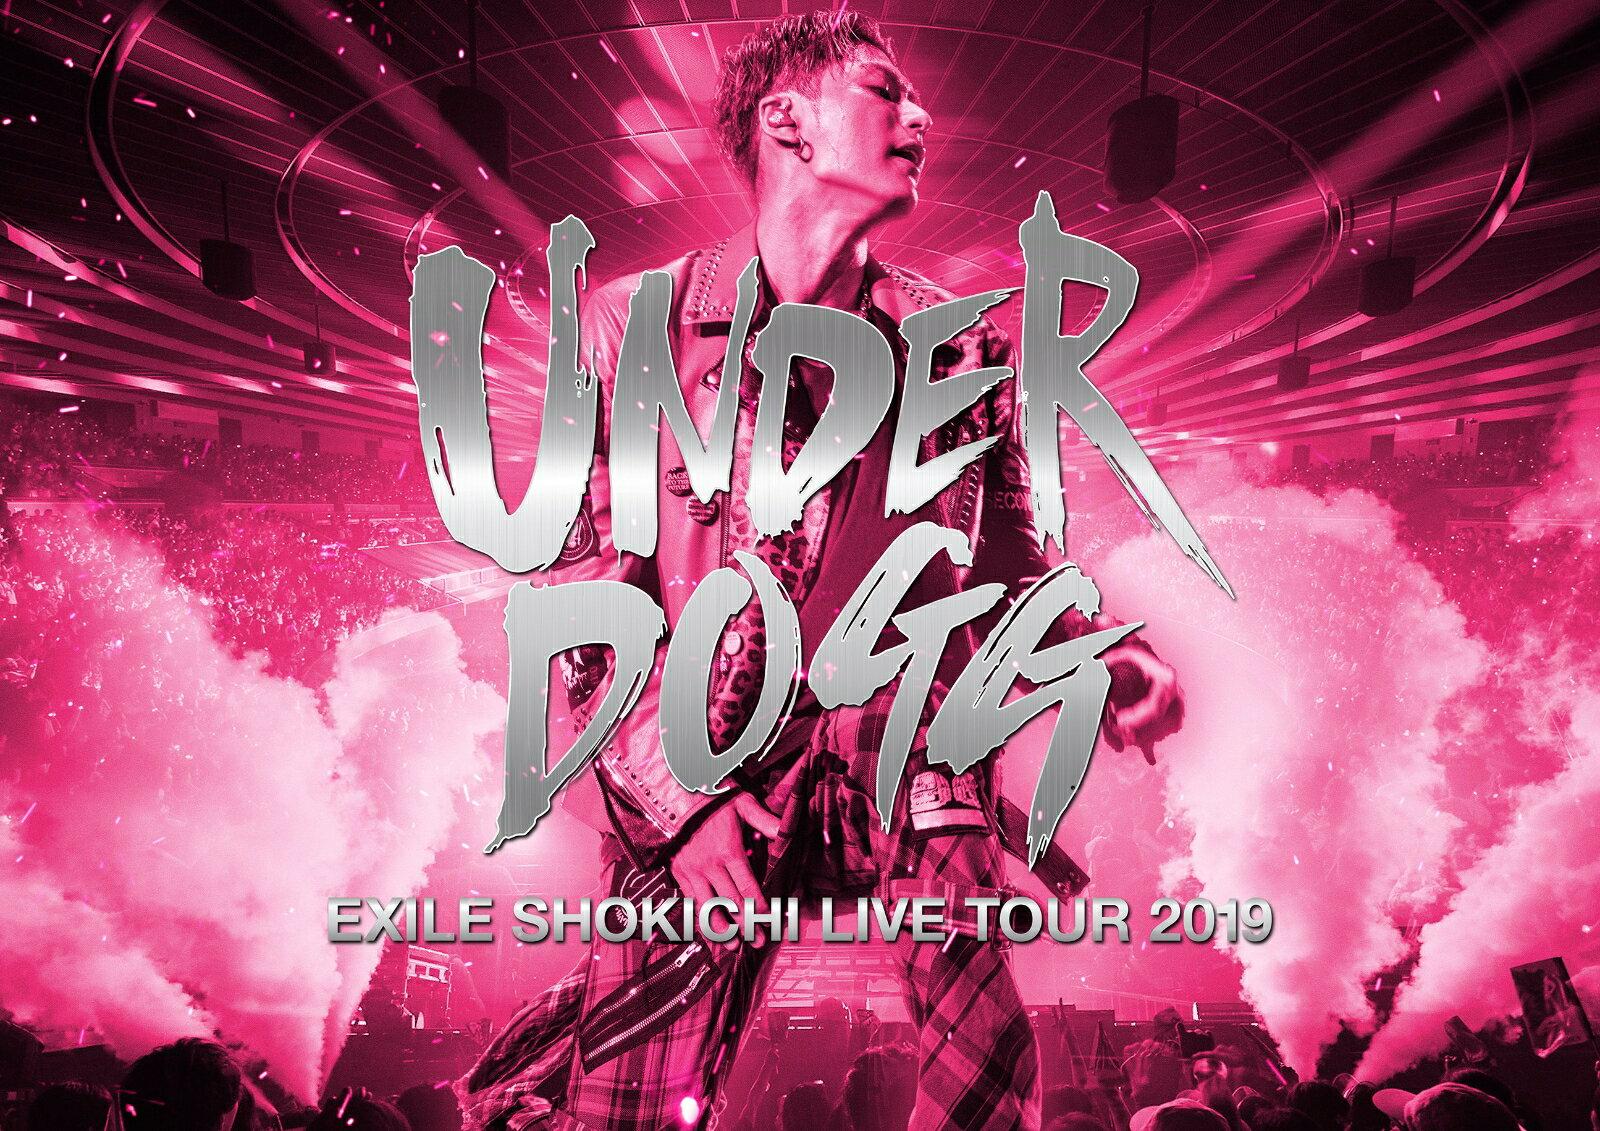 EXILE SHOKICHI LIVE TOUR 2019 UNDERDOGG(初回生産限定盤)【Blu-ray】